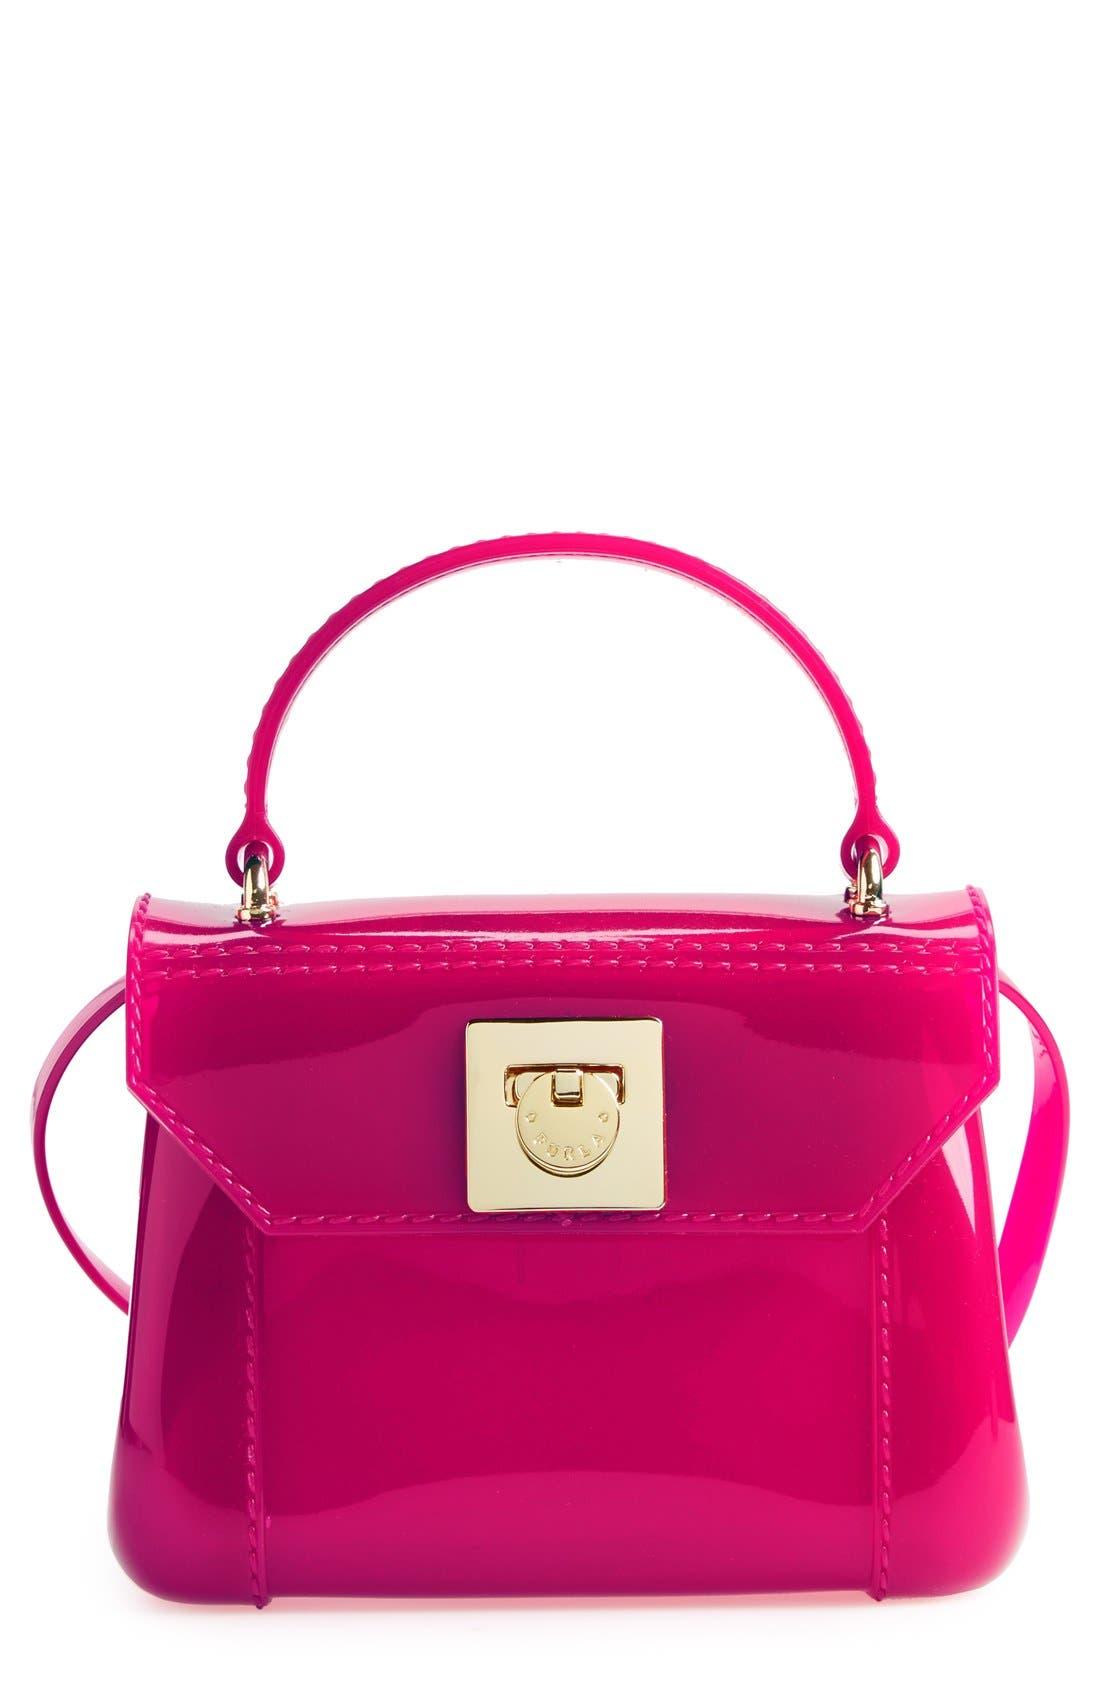 Main Image - Furla 'Candy - Mini' Top Handle Crossbody Bag